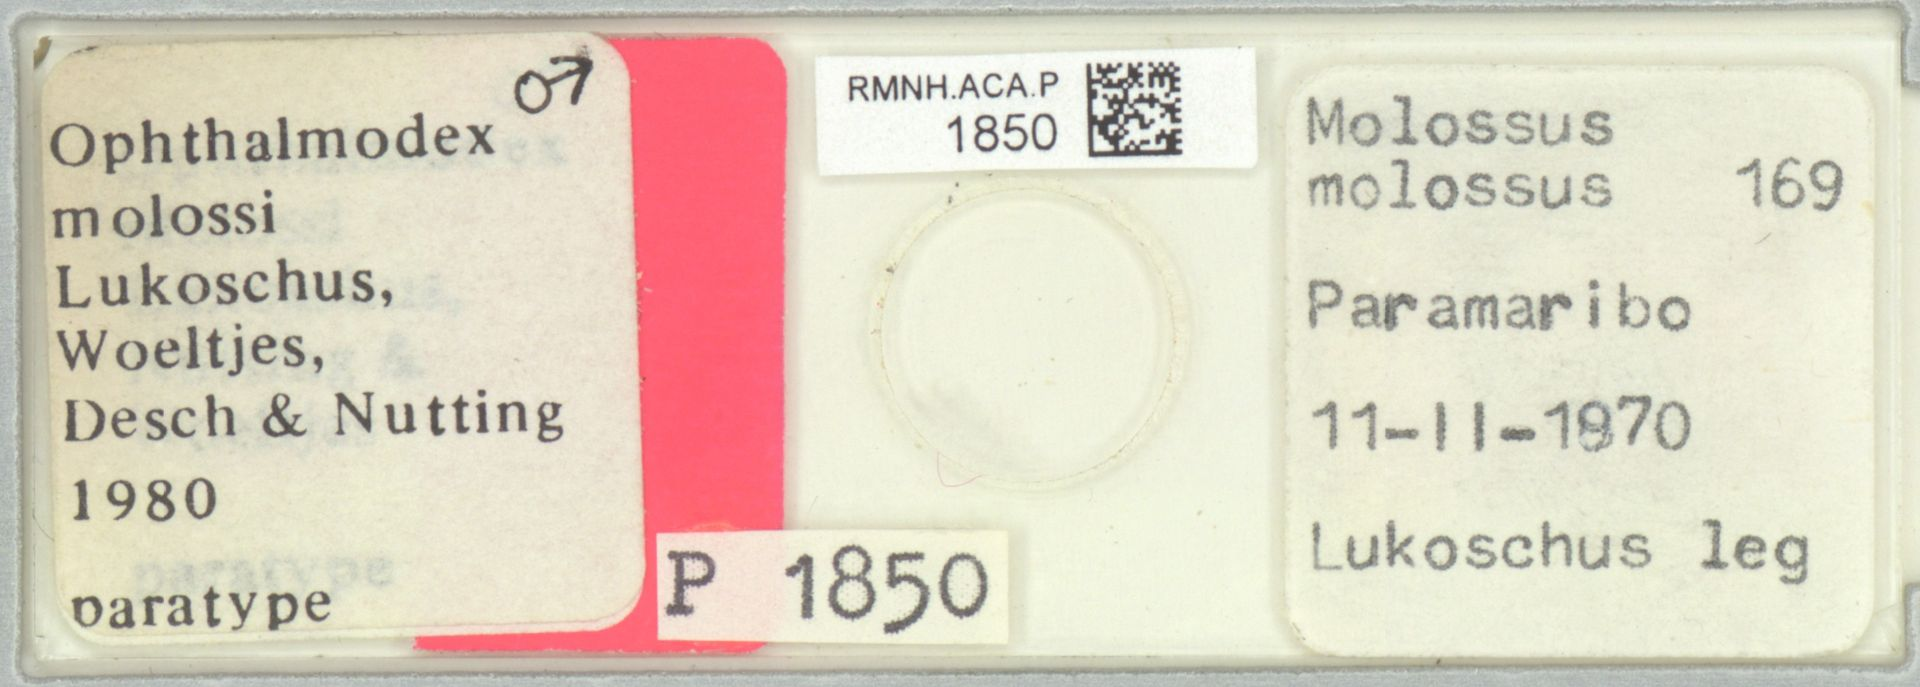 RMNH.ACA.P.1850   Ophthalmodex molossi Lukoschus, Woeltjes, Desh & Nutting, 1980